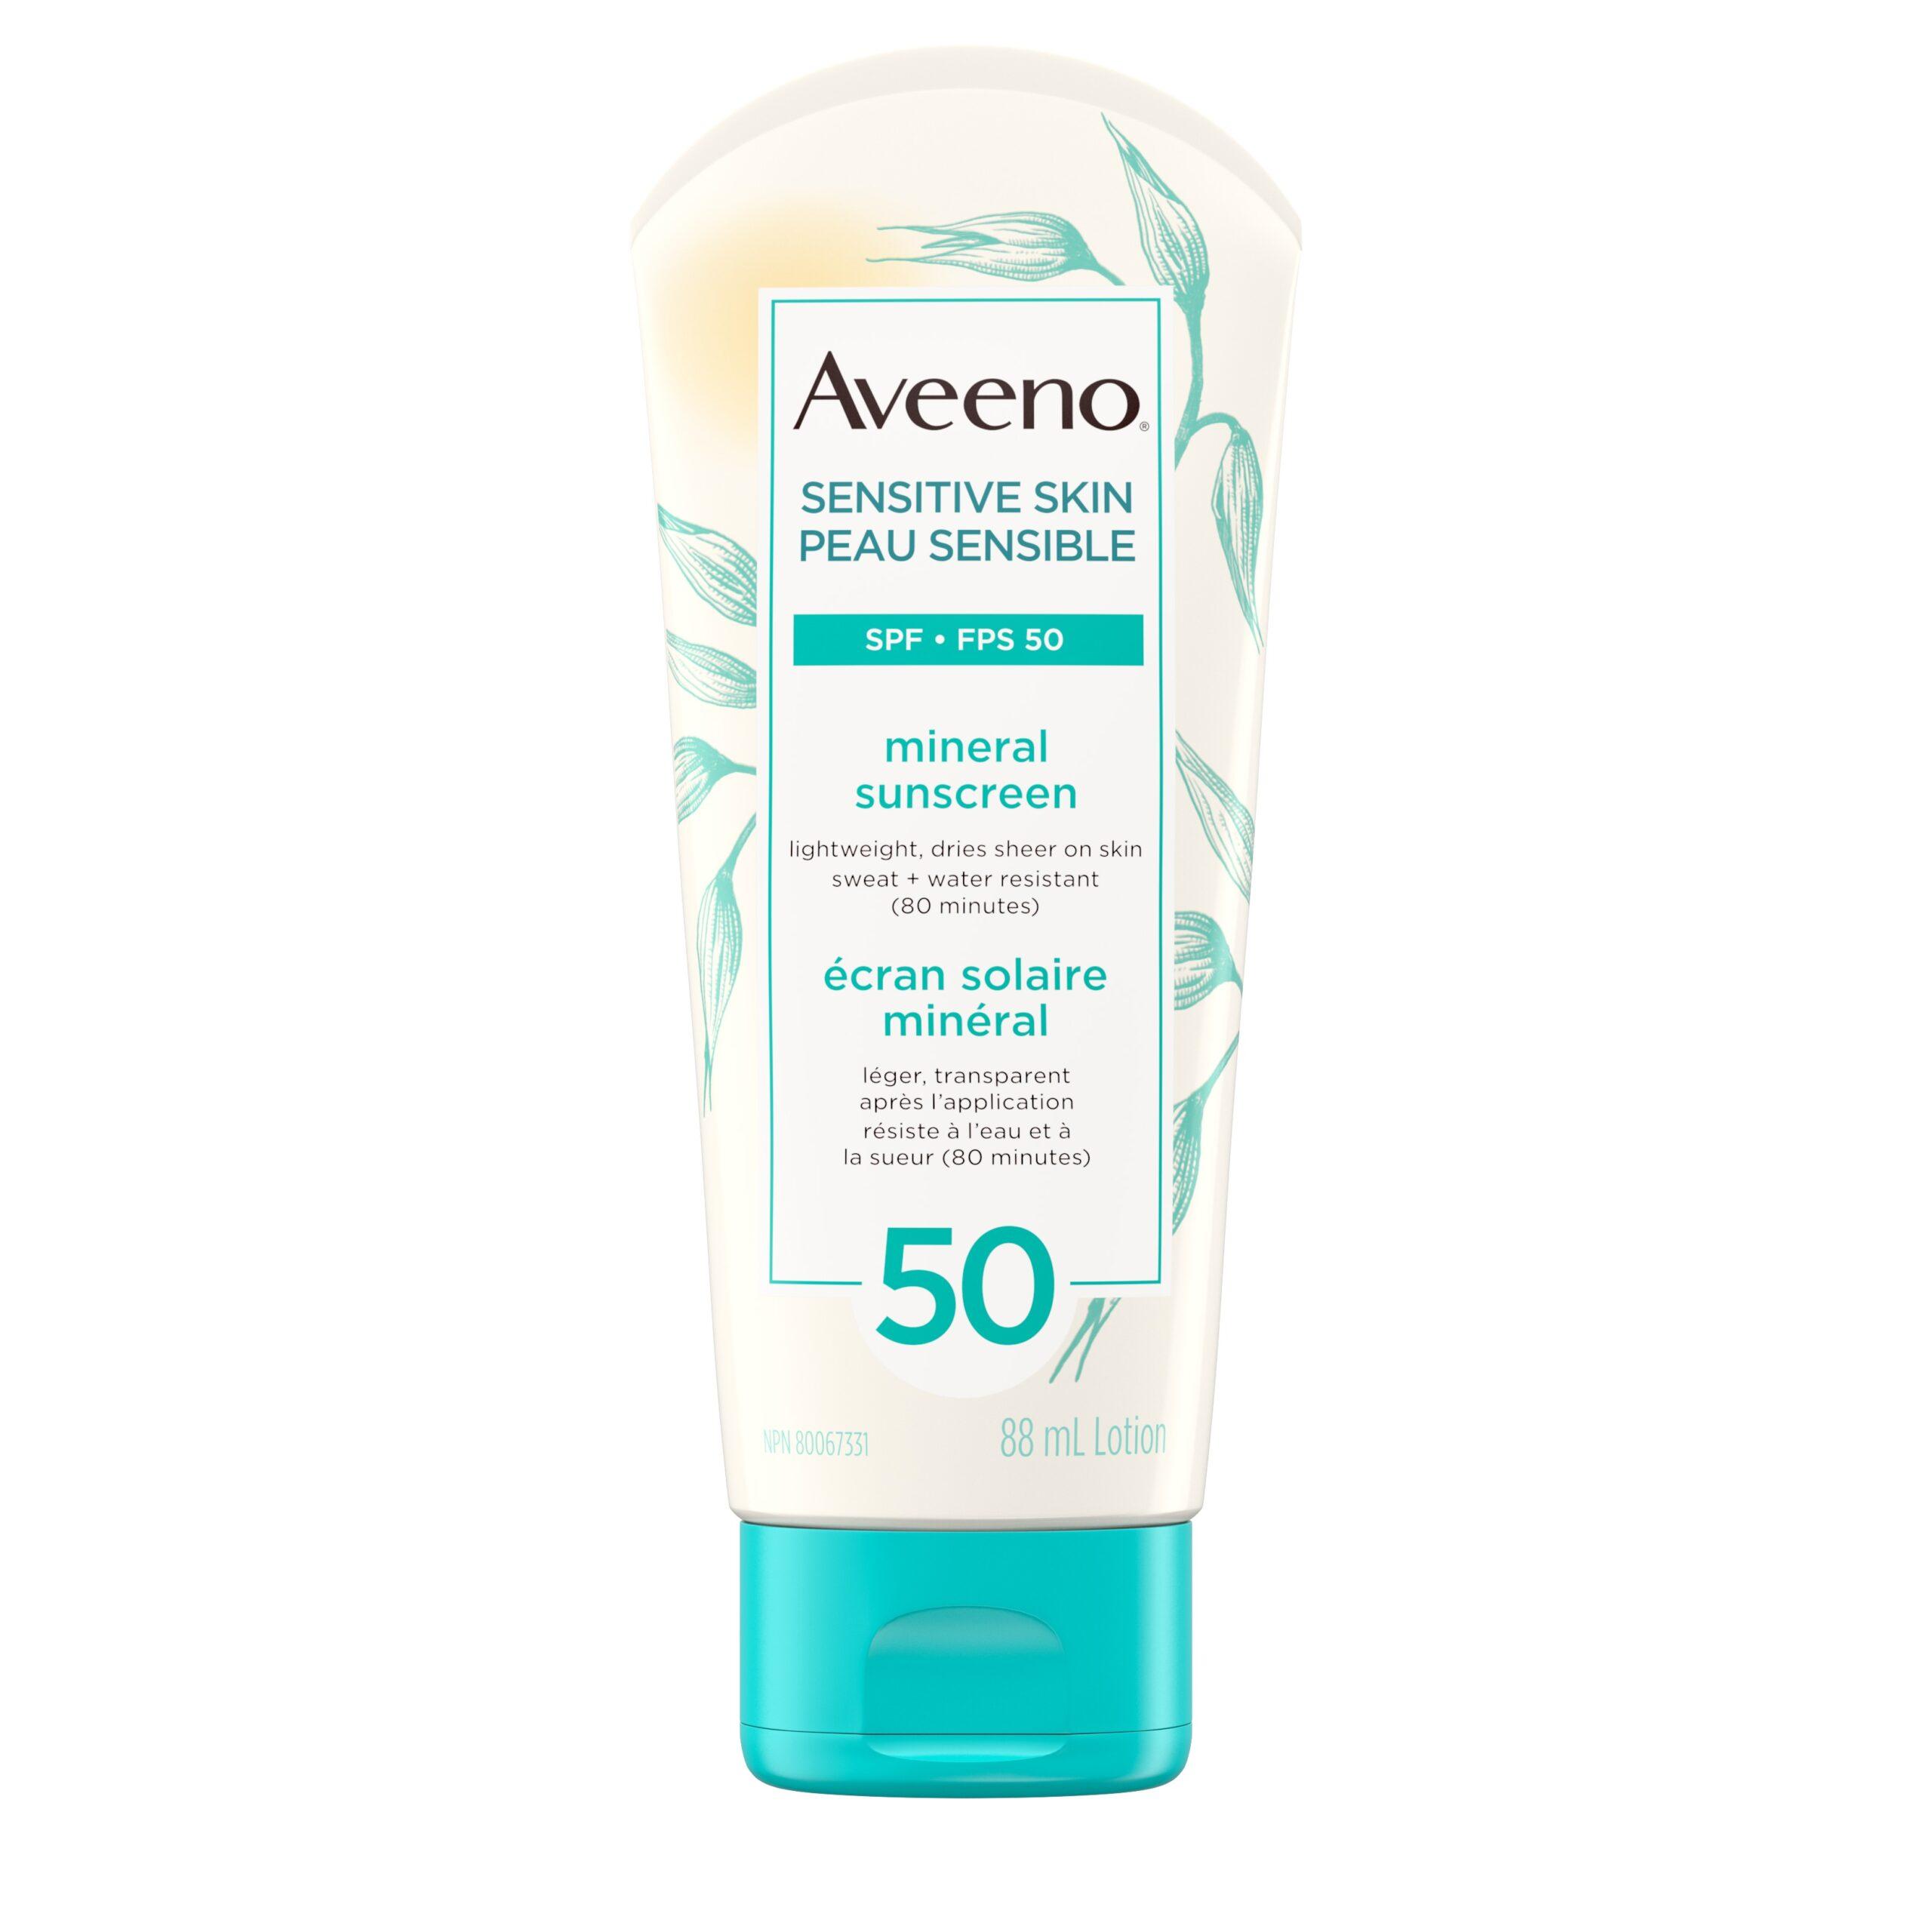 Aveeno Sensitive Skin SPF 50 Mineral Sunscreen - $19.99 CAD